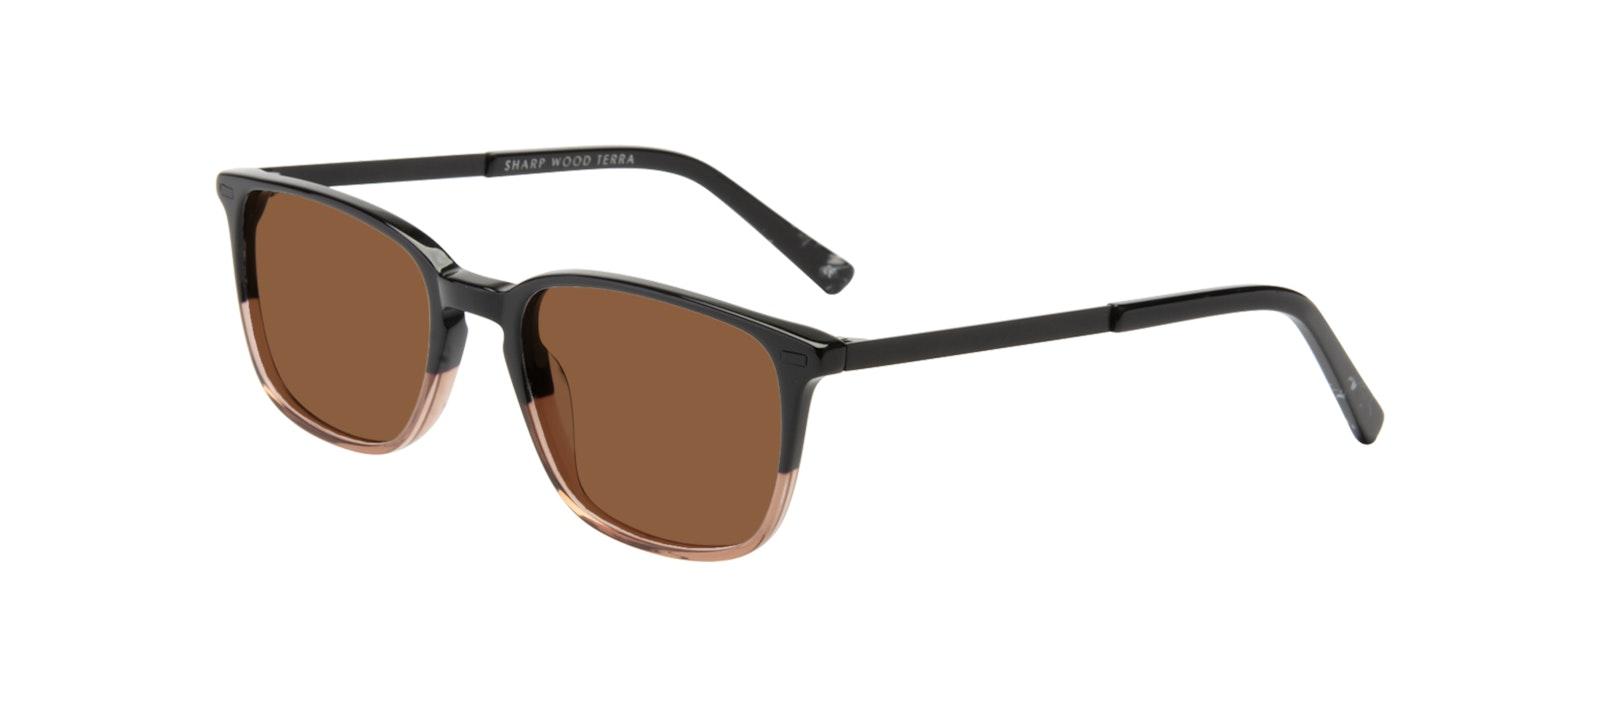 Affordable Fashion Glasses Rectangle Sunglasses Men Sharp Wood Terra Tilt